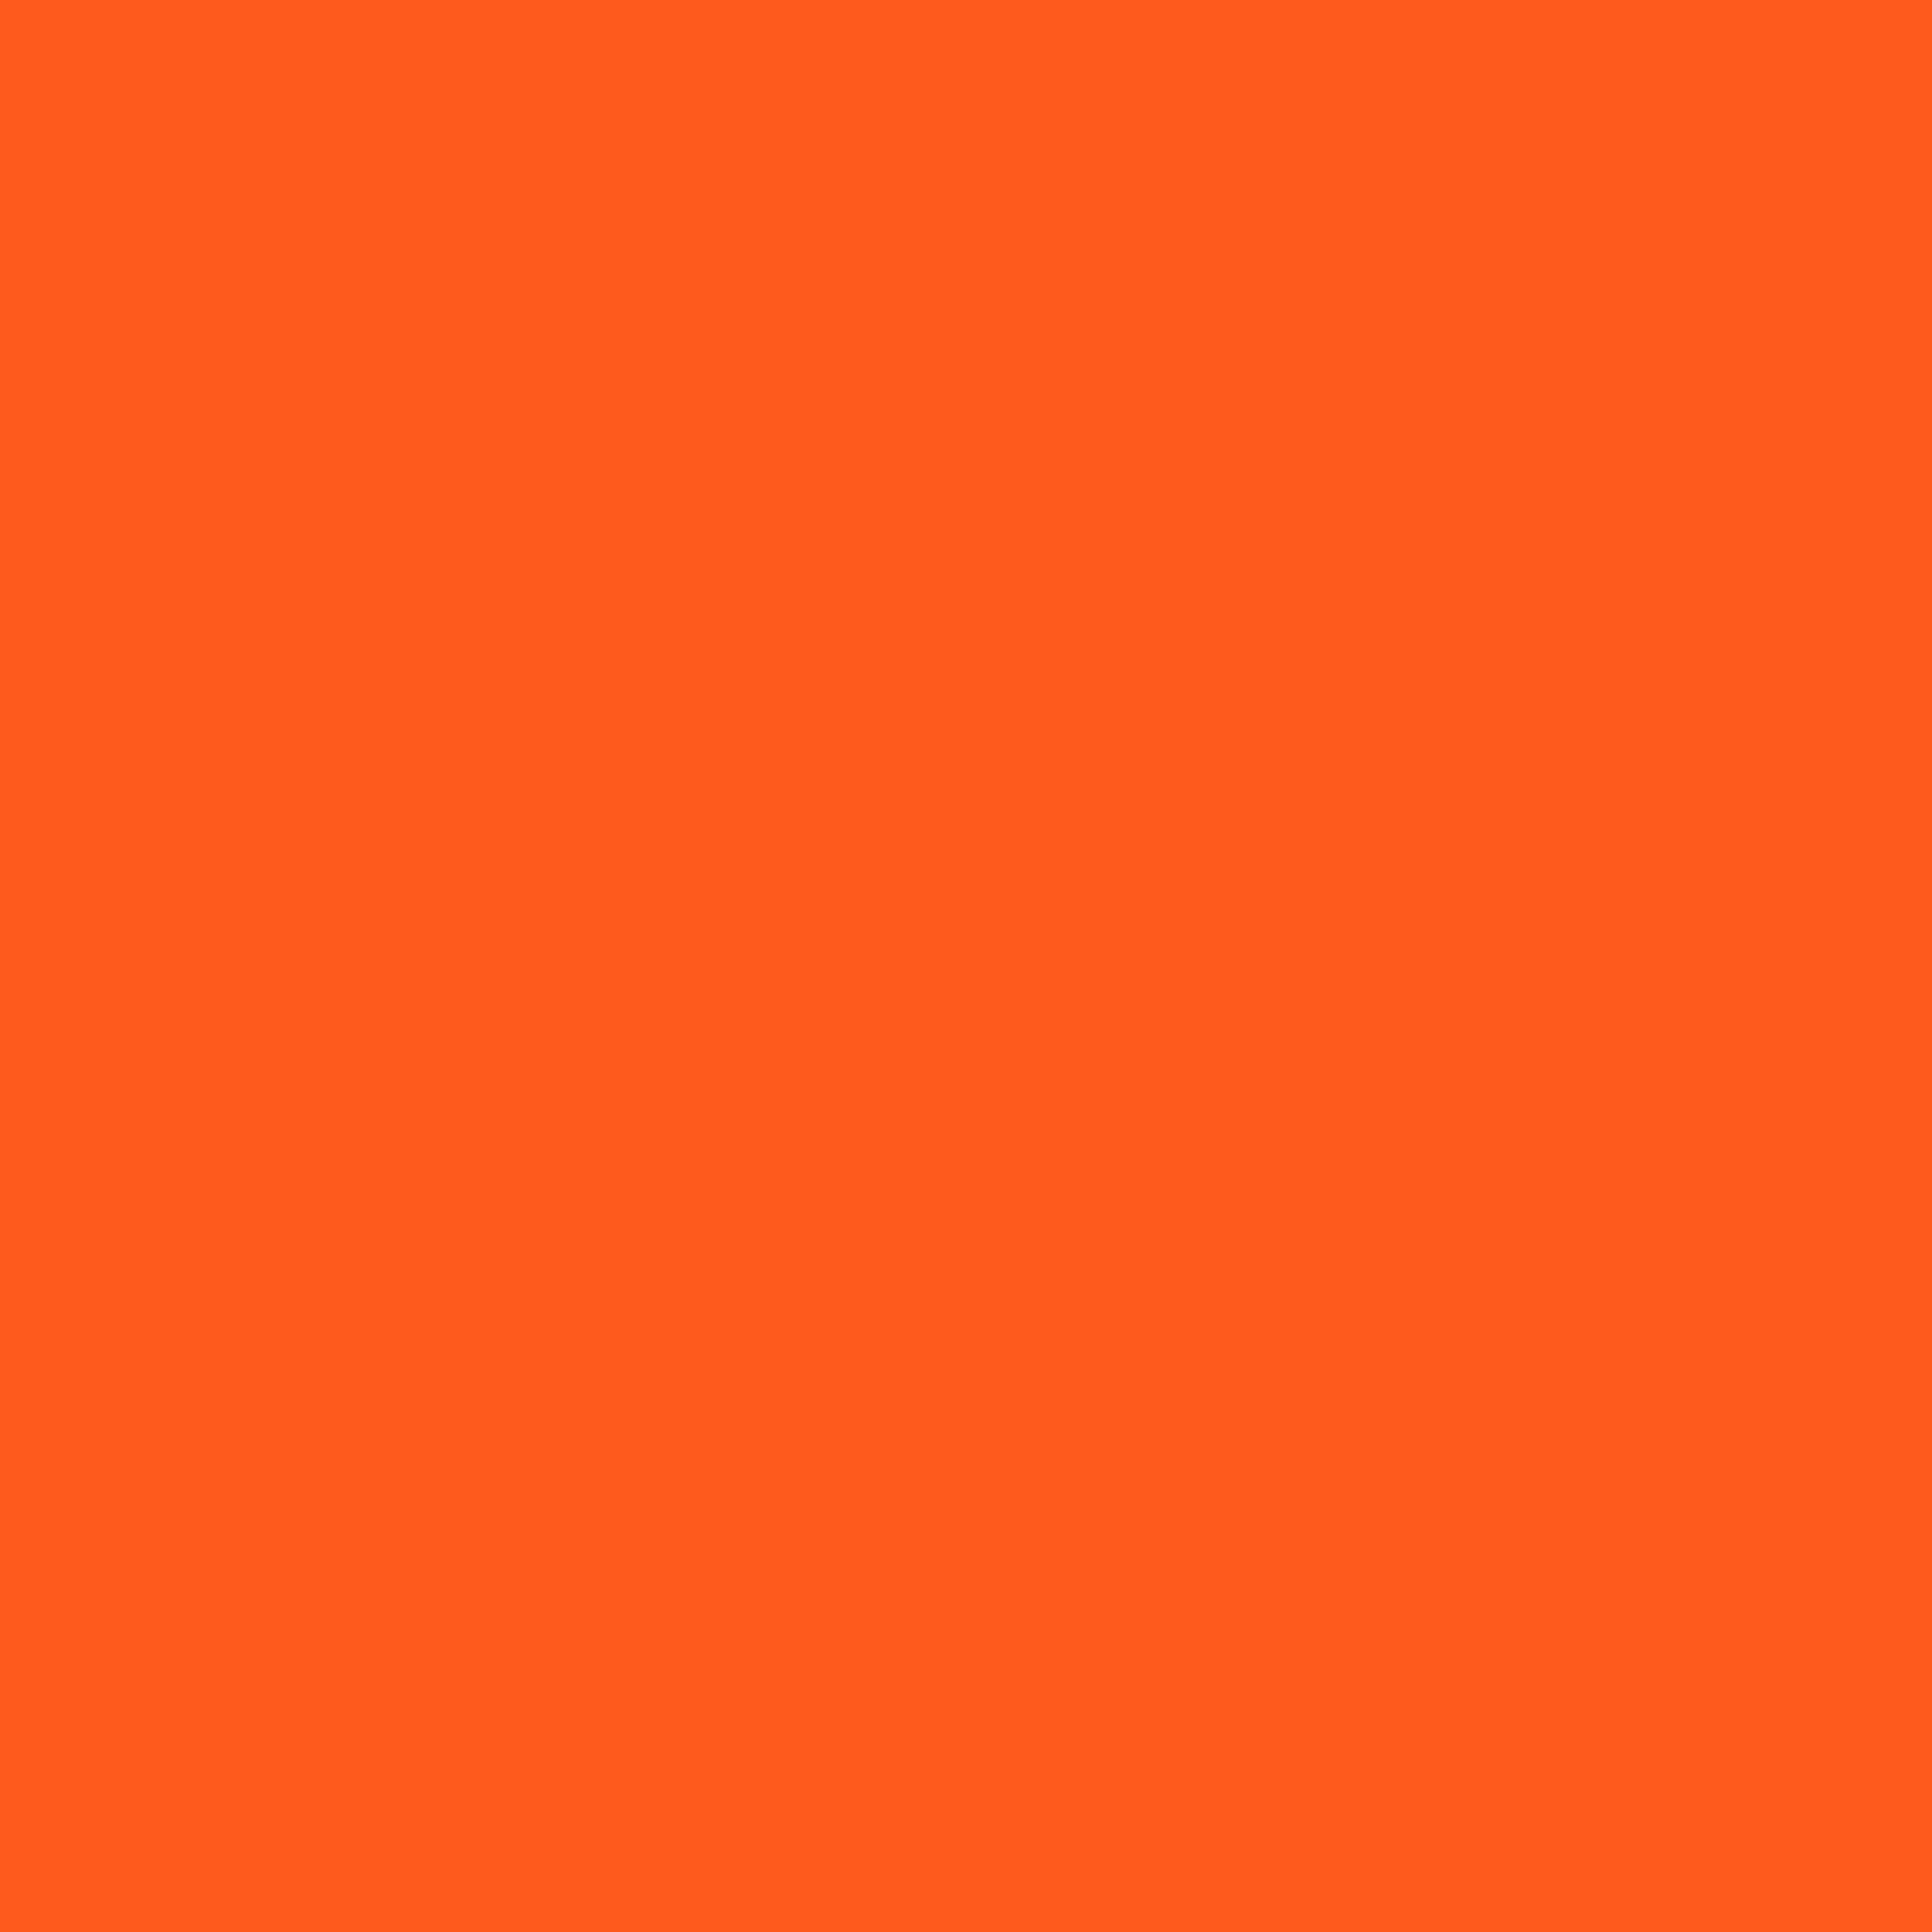 2048x2048 Giants Orange Solid Color Background